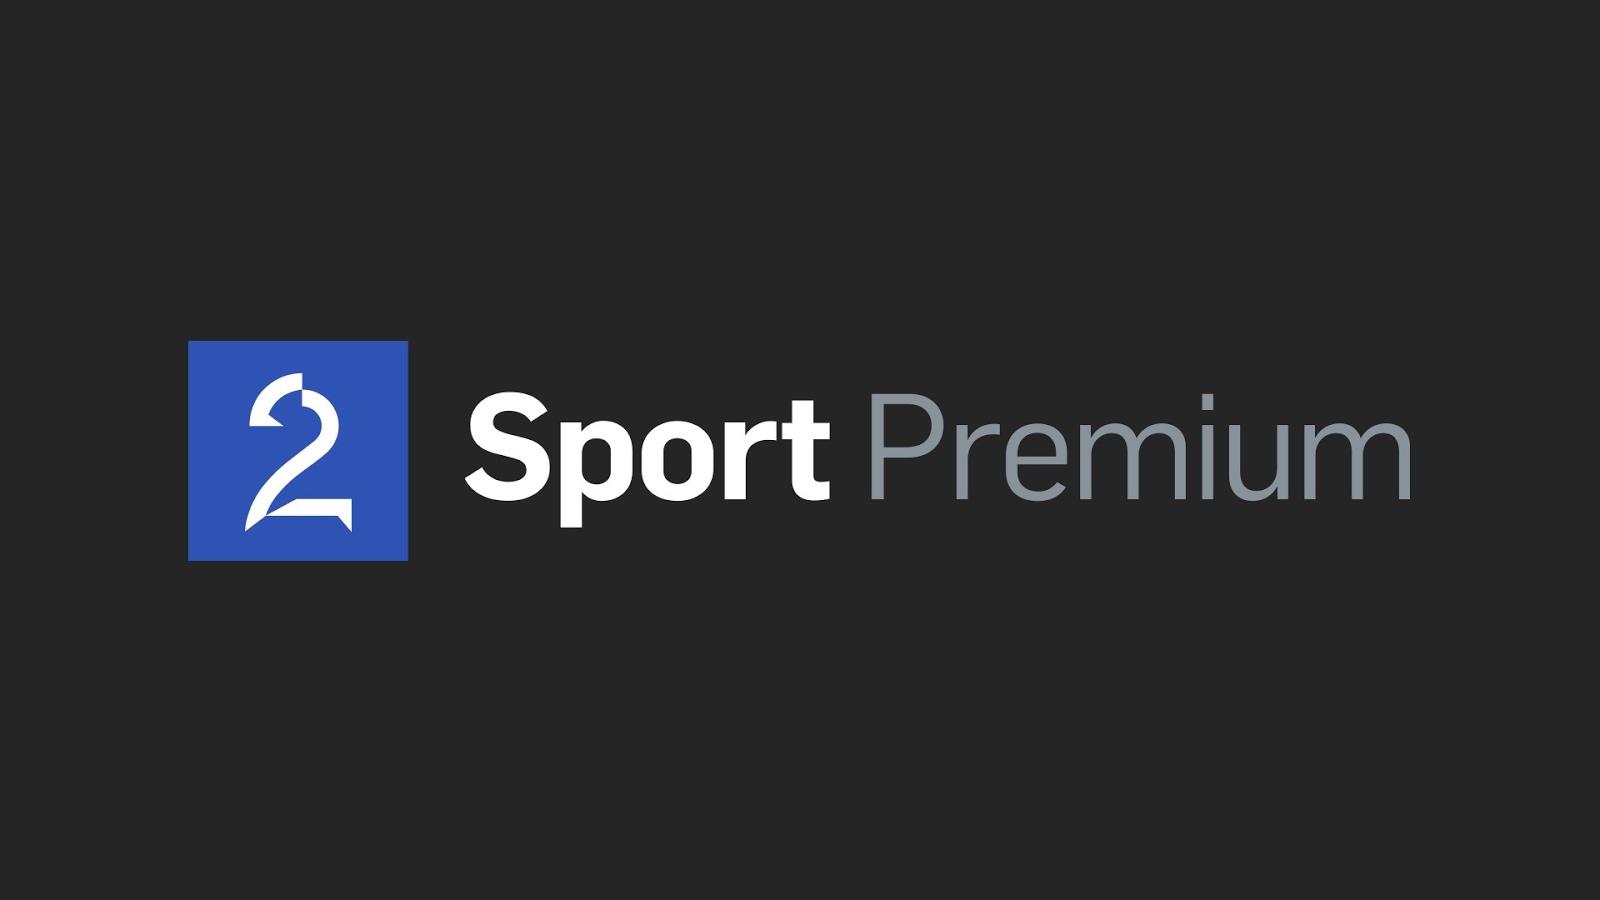 TV 2 Sport Premium 4 HD - Intelsat Frequency - Freqode com